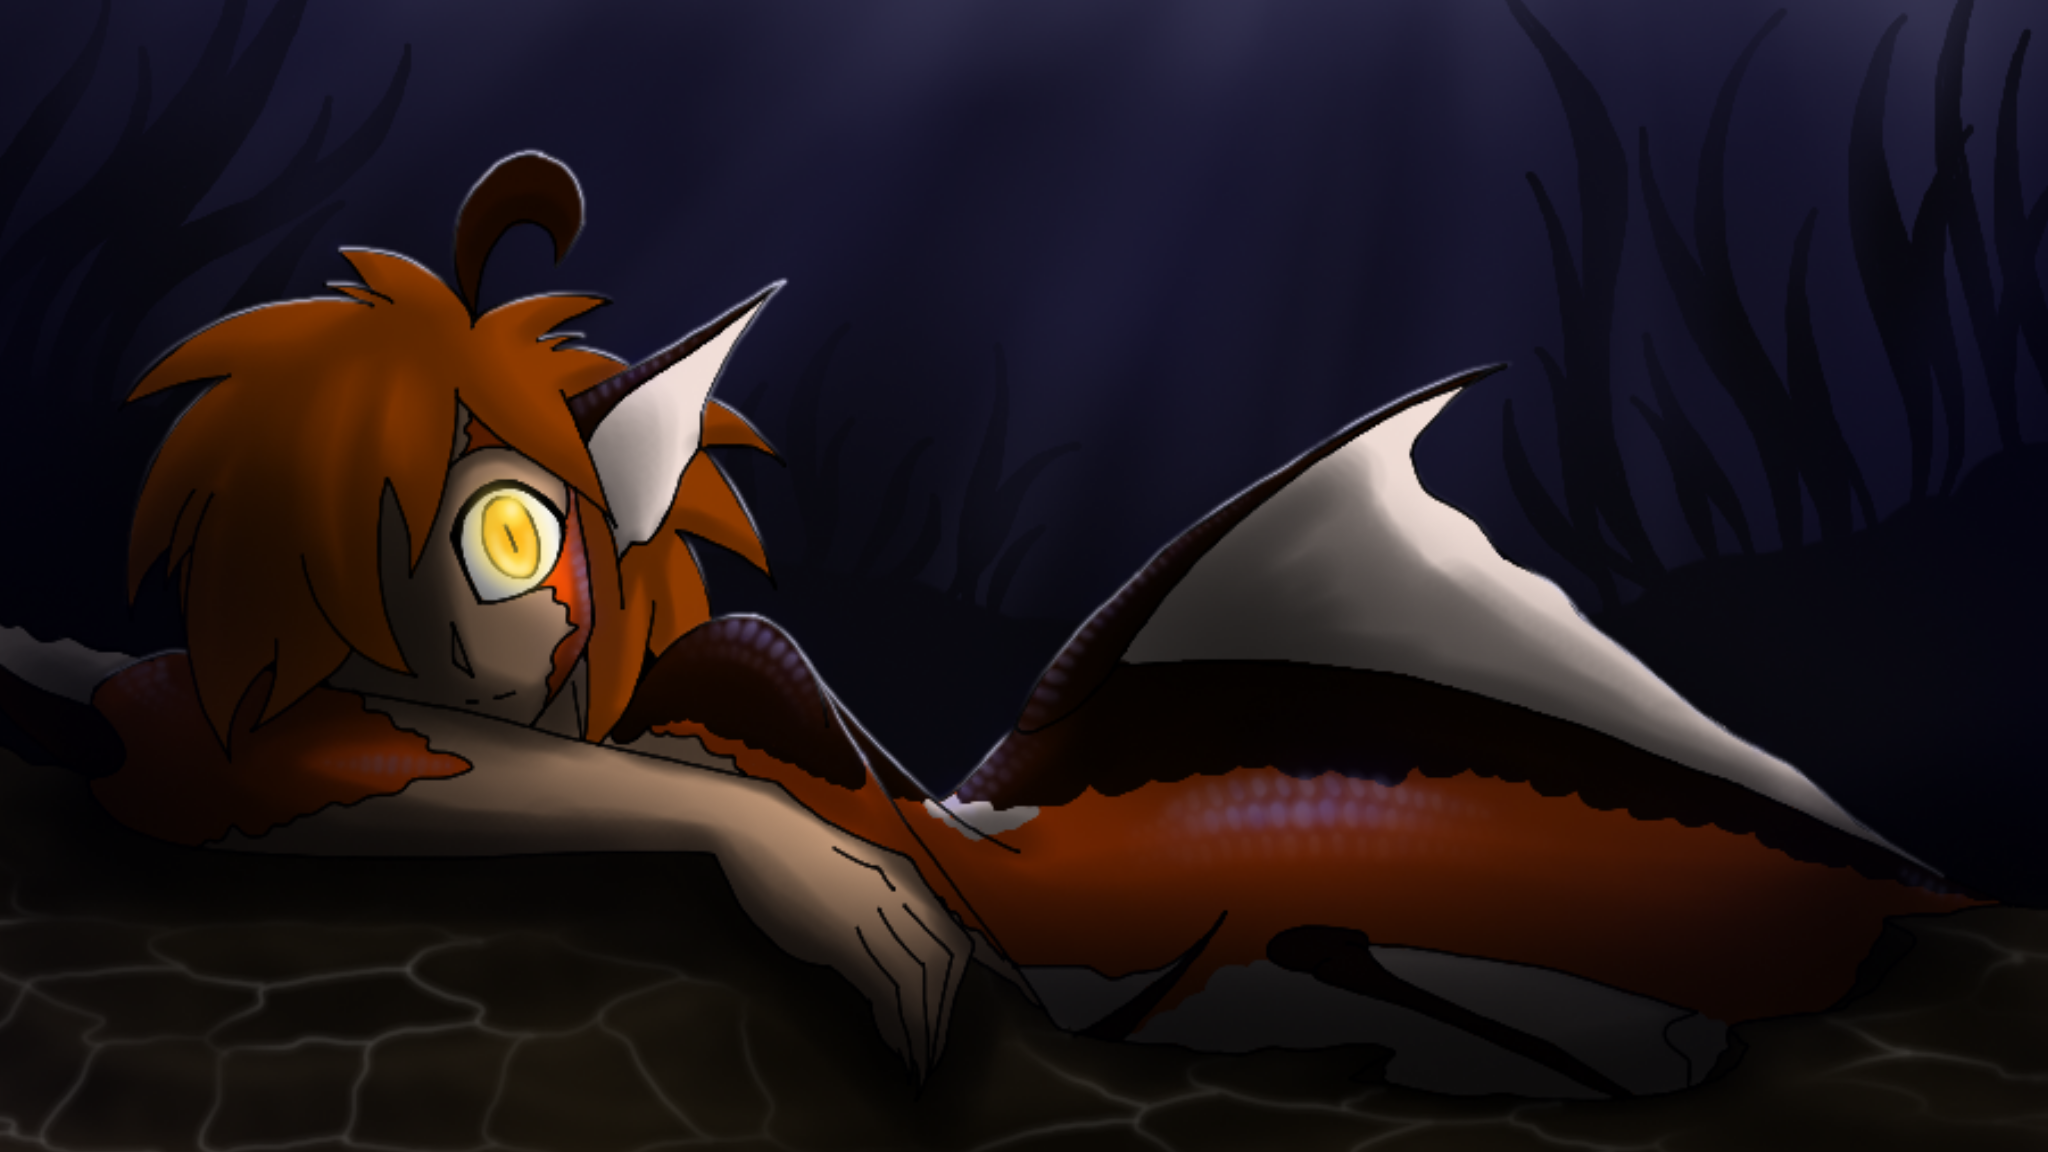 Akoia Eyes in the Night by CoffeeAddictedDragon